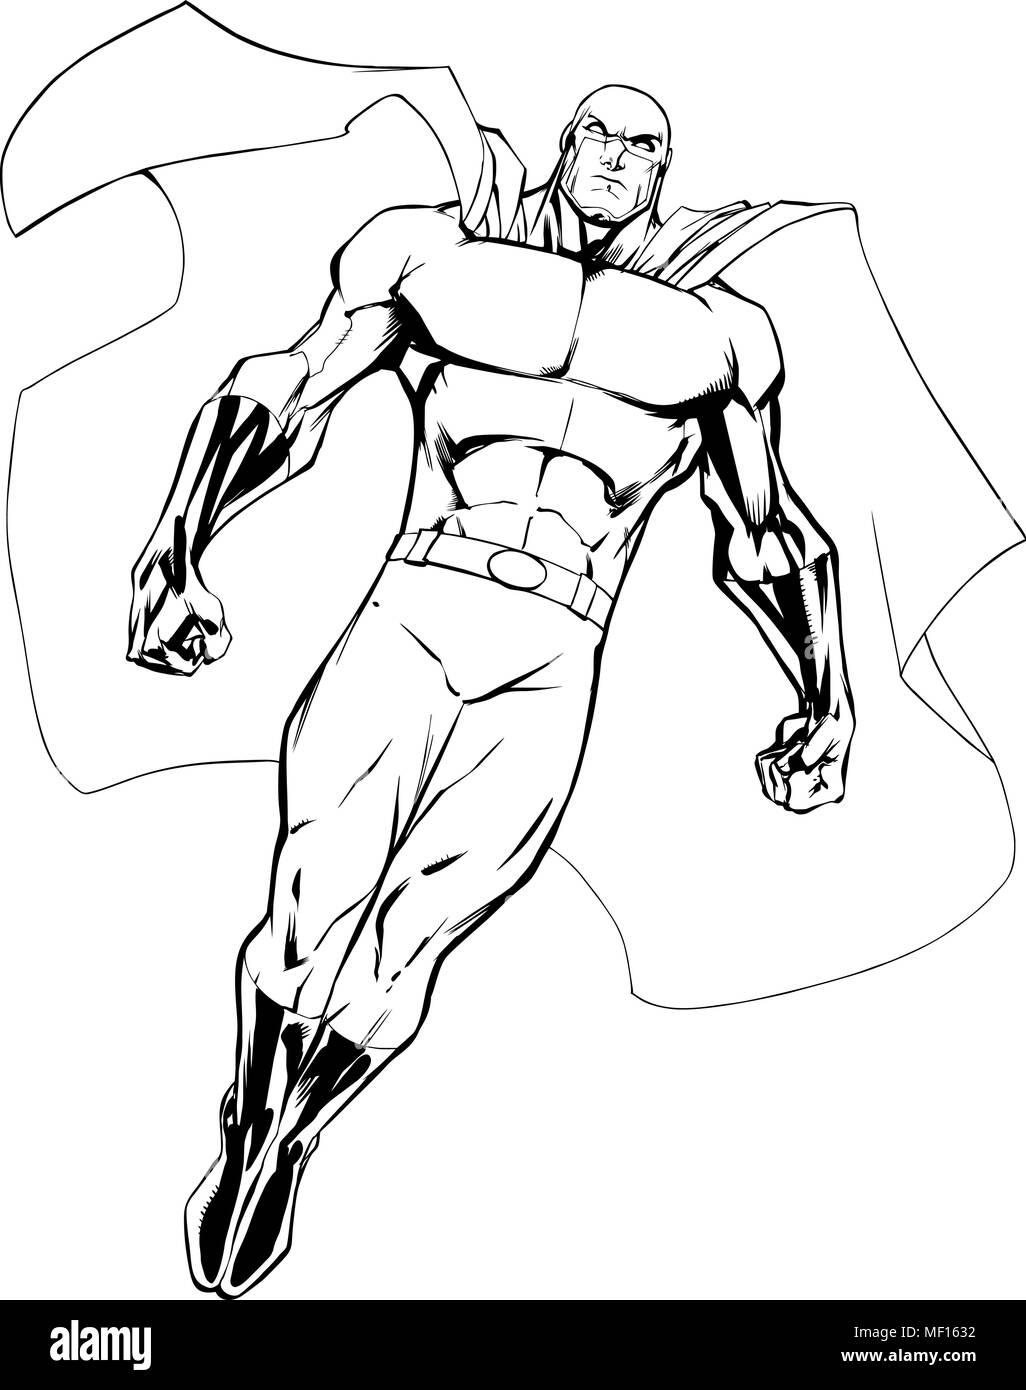 Superhero Cape Art Stock Photos Amp Superhero Cape Art Stock